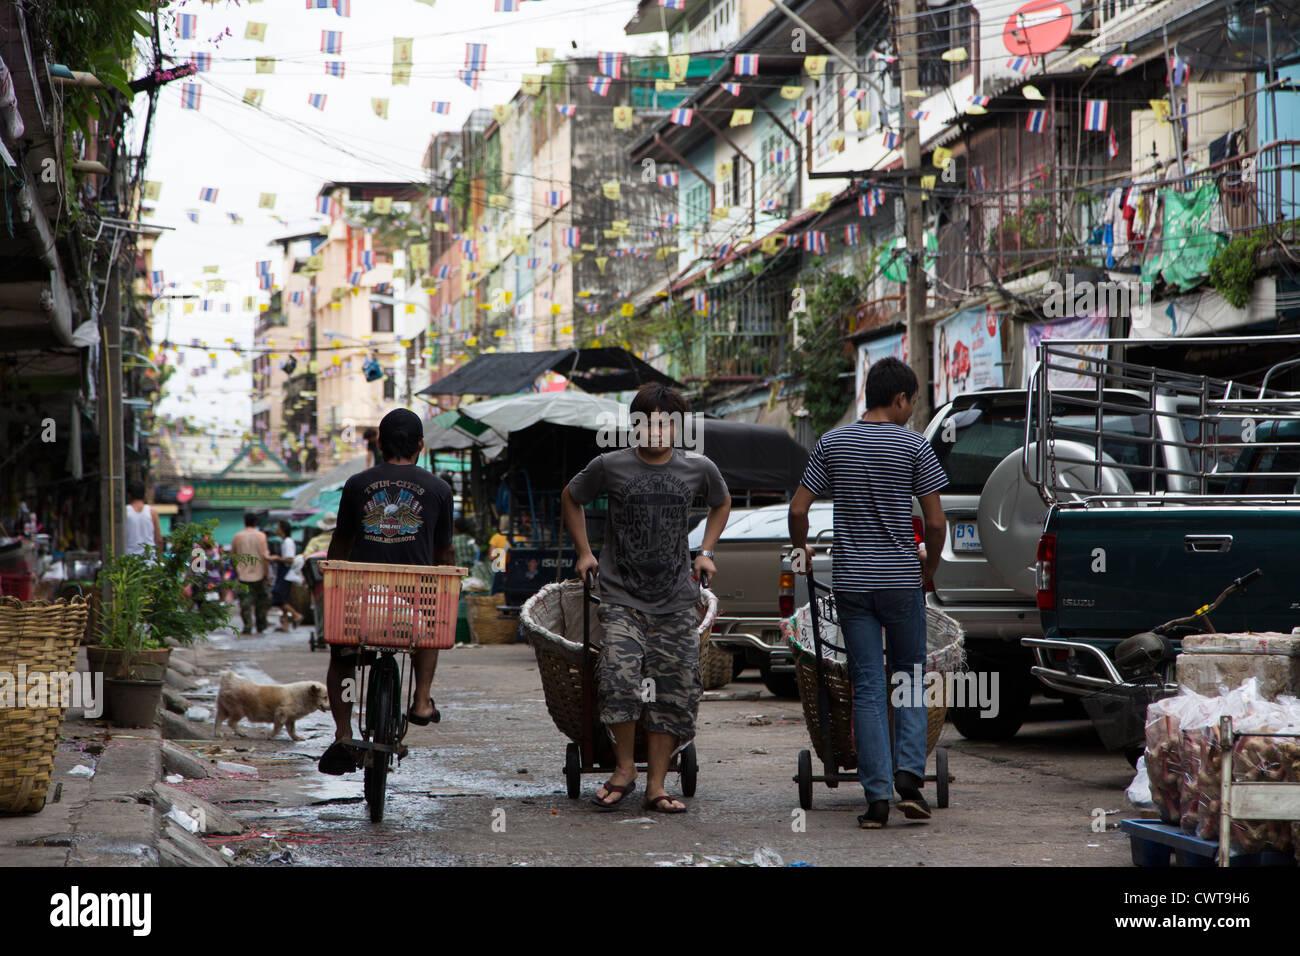 Thai worker pulling/pushing carts in the street around Pak Klong Talad (flower market) in Bangkok, Thailand Stock Photo